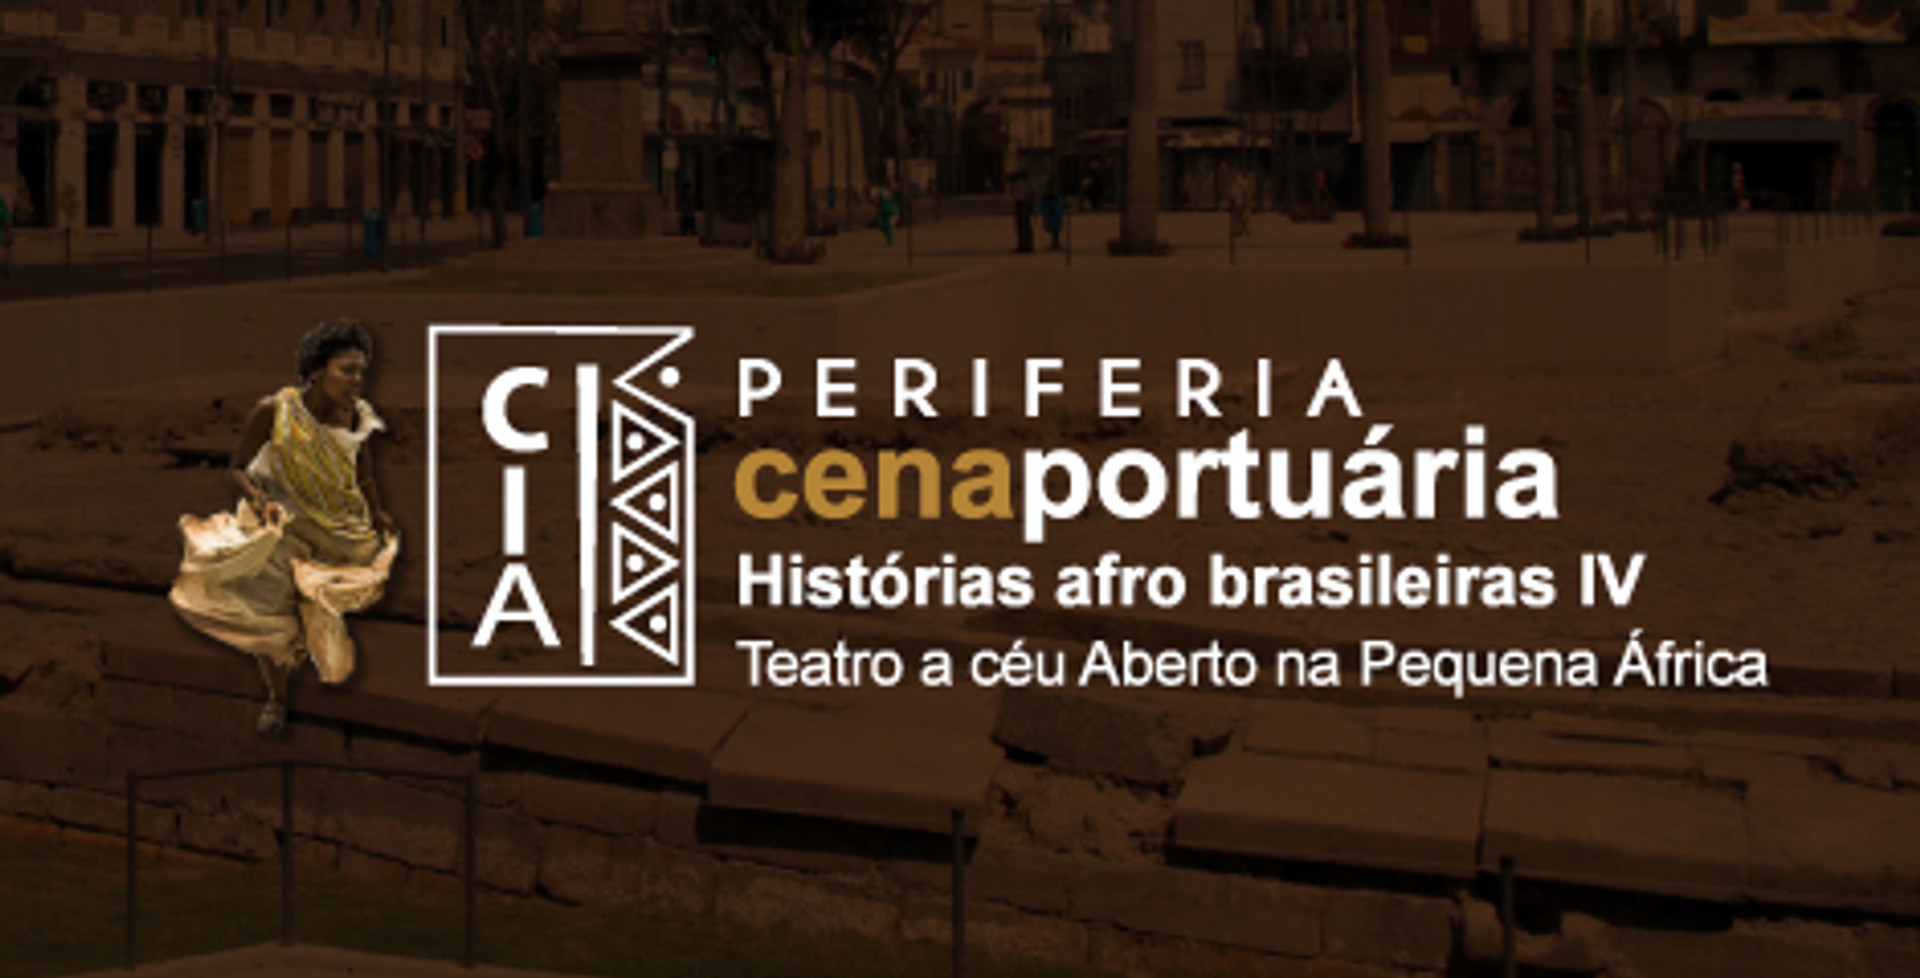 Capa Facebook Animada Projeto Periferia